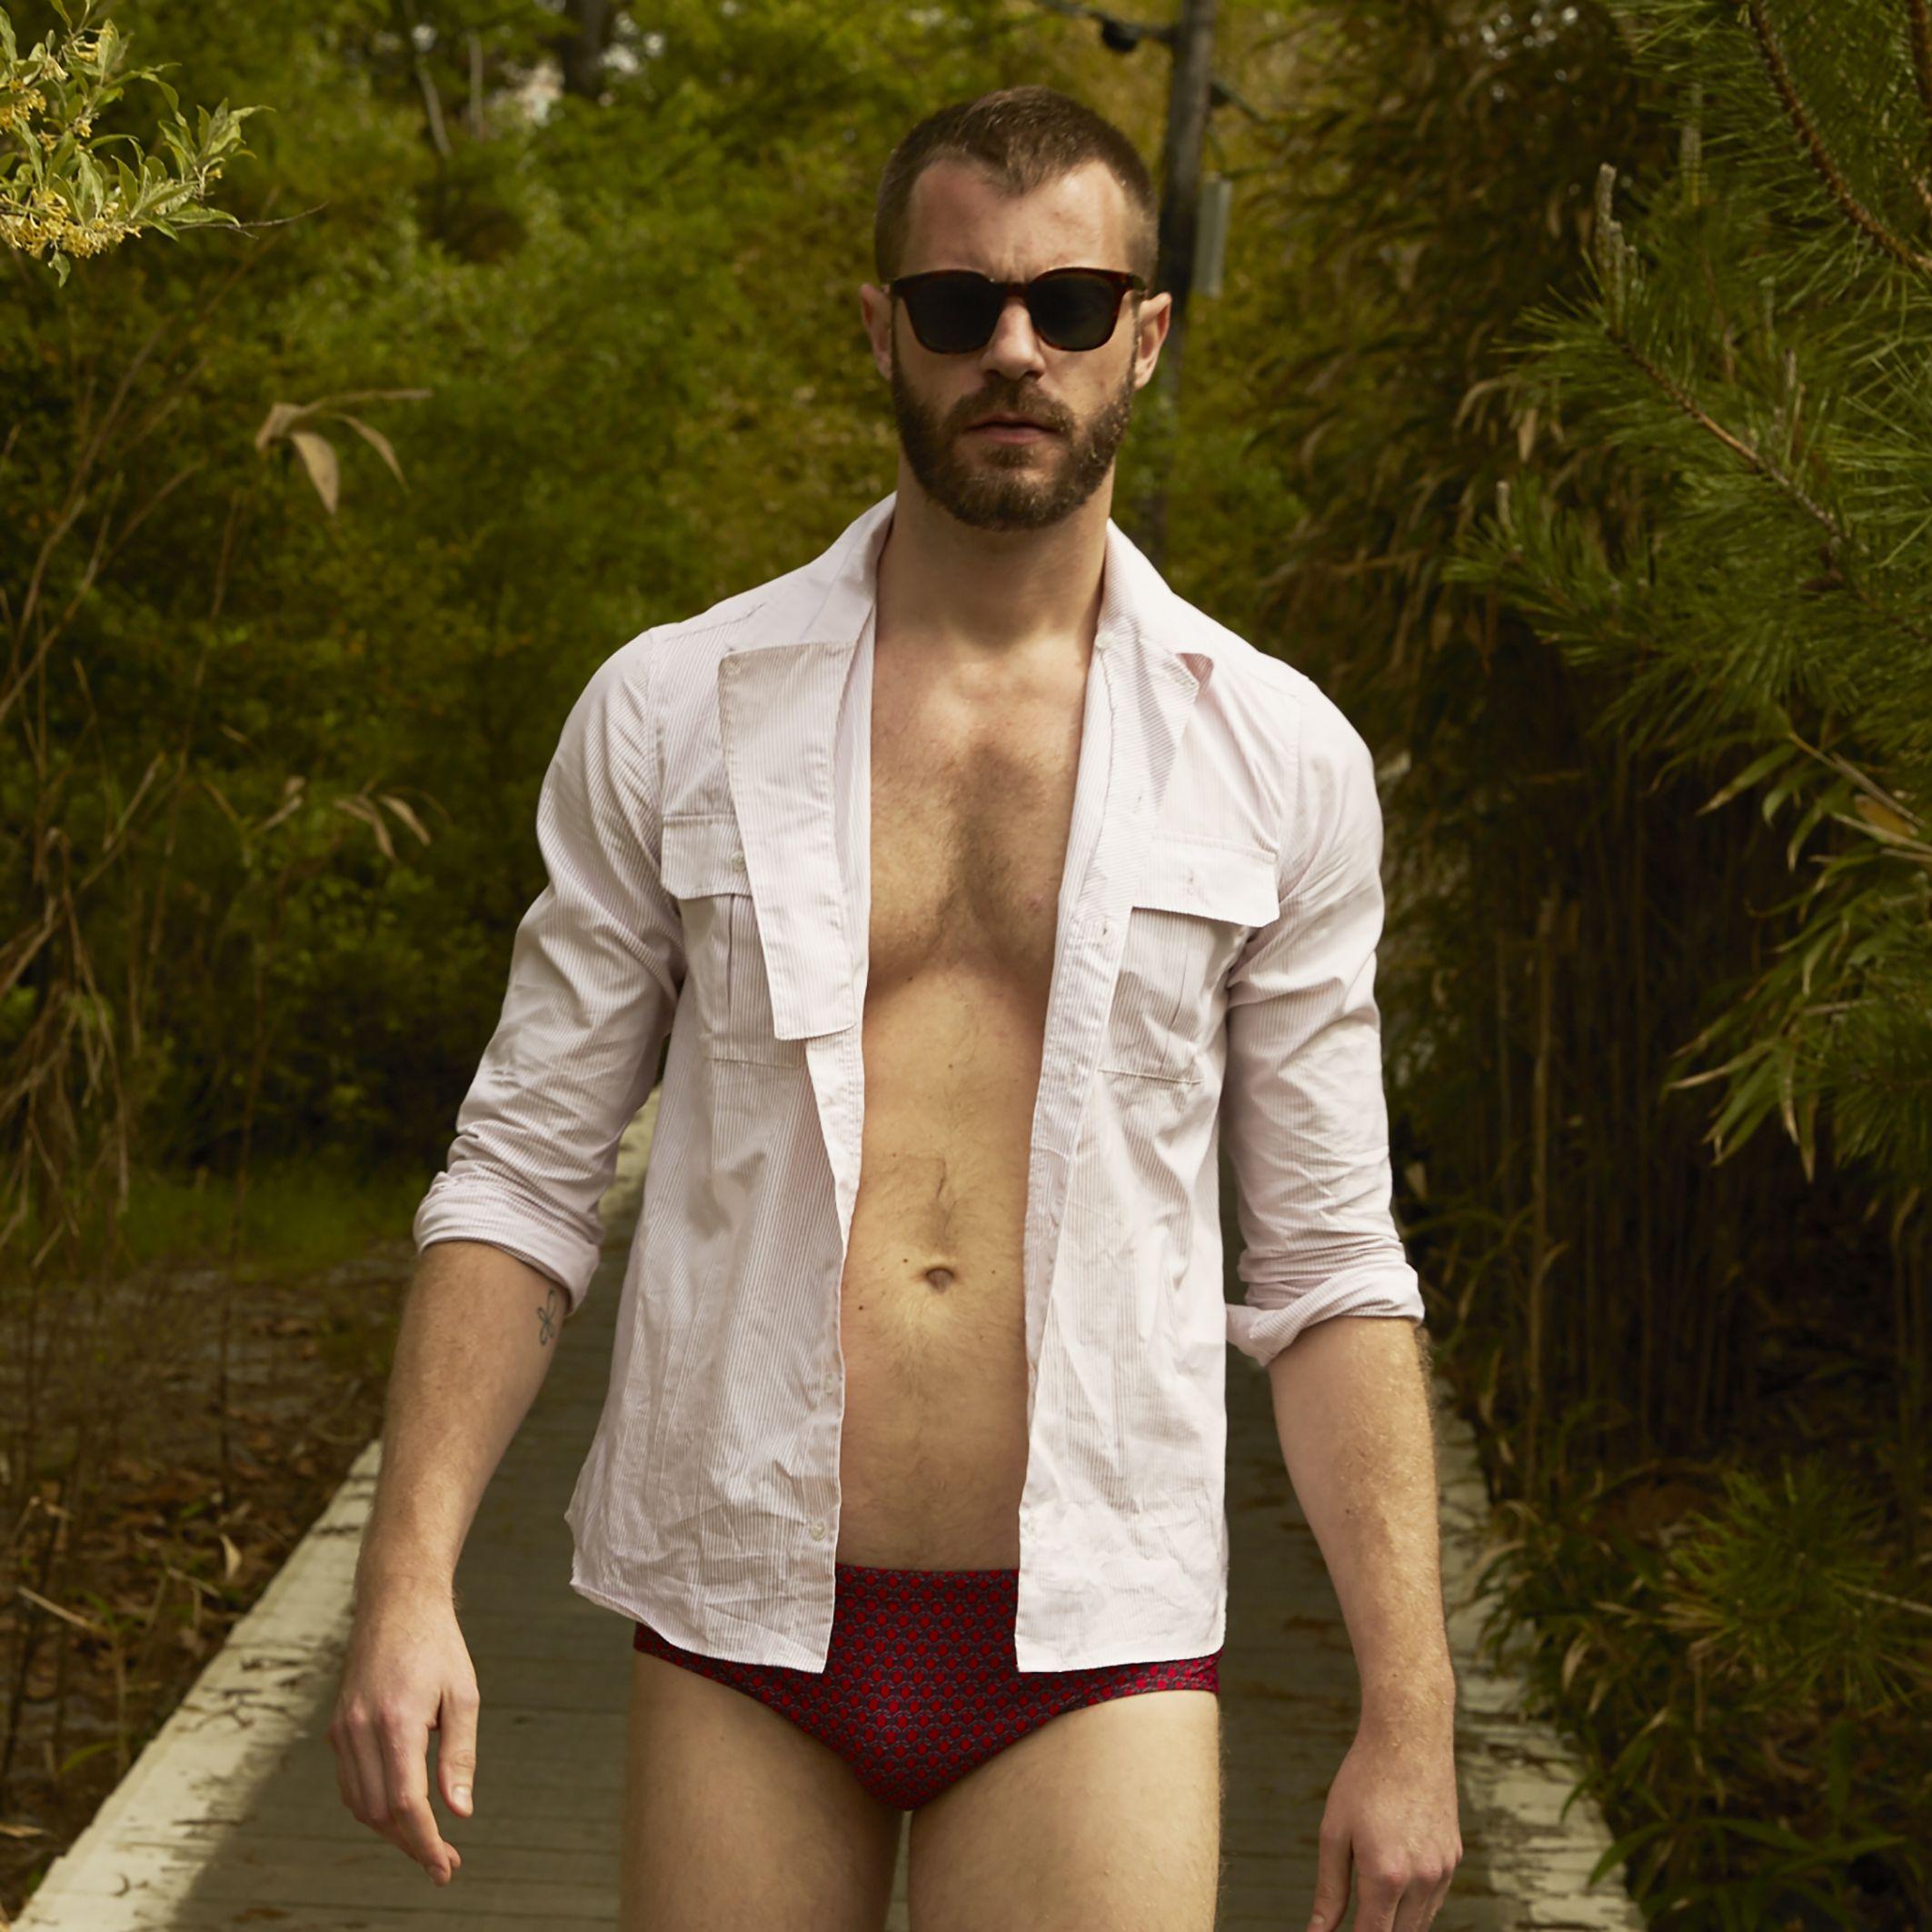 On my way to the beach #menfashion #summerstyle #beachwear #robinsonlesbains #summertrip